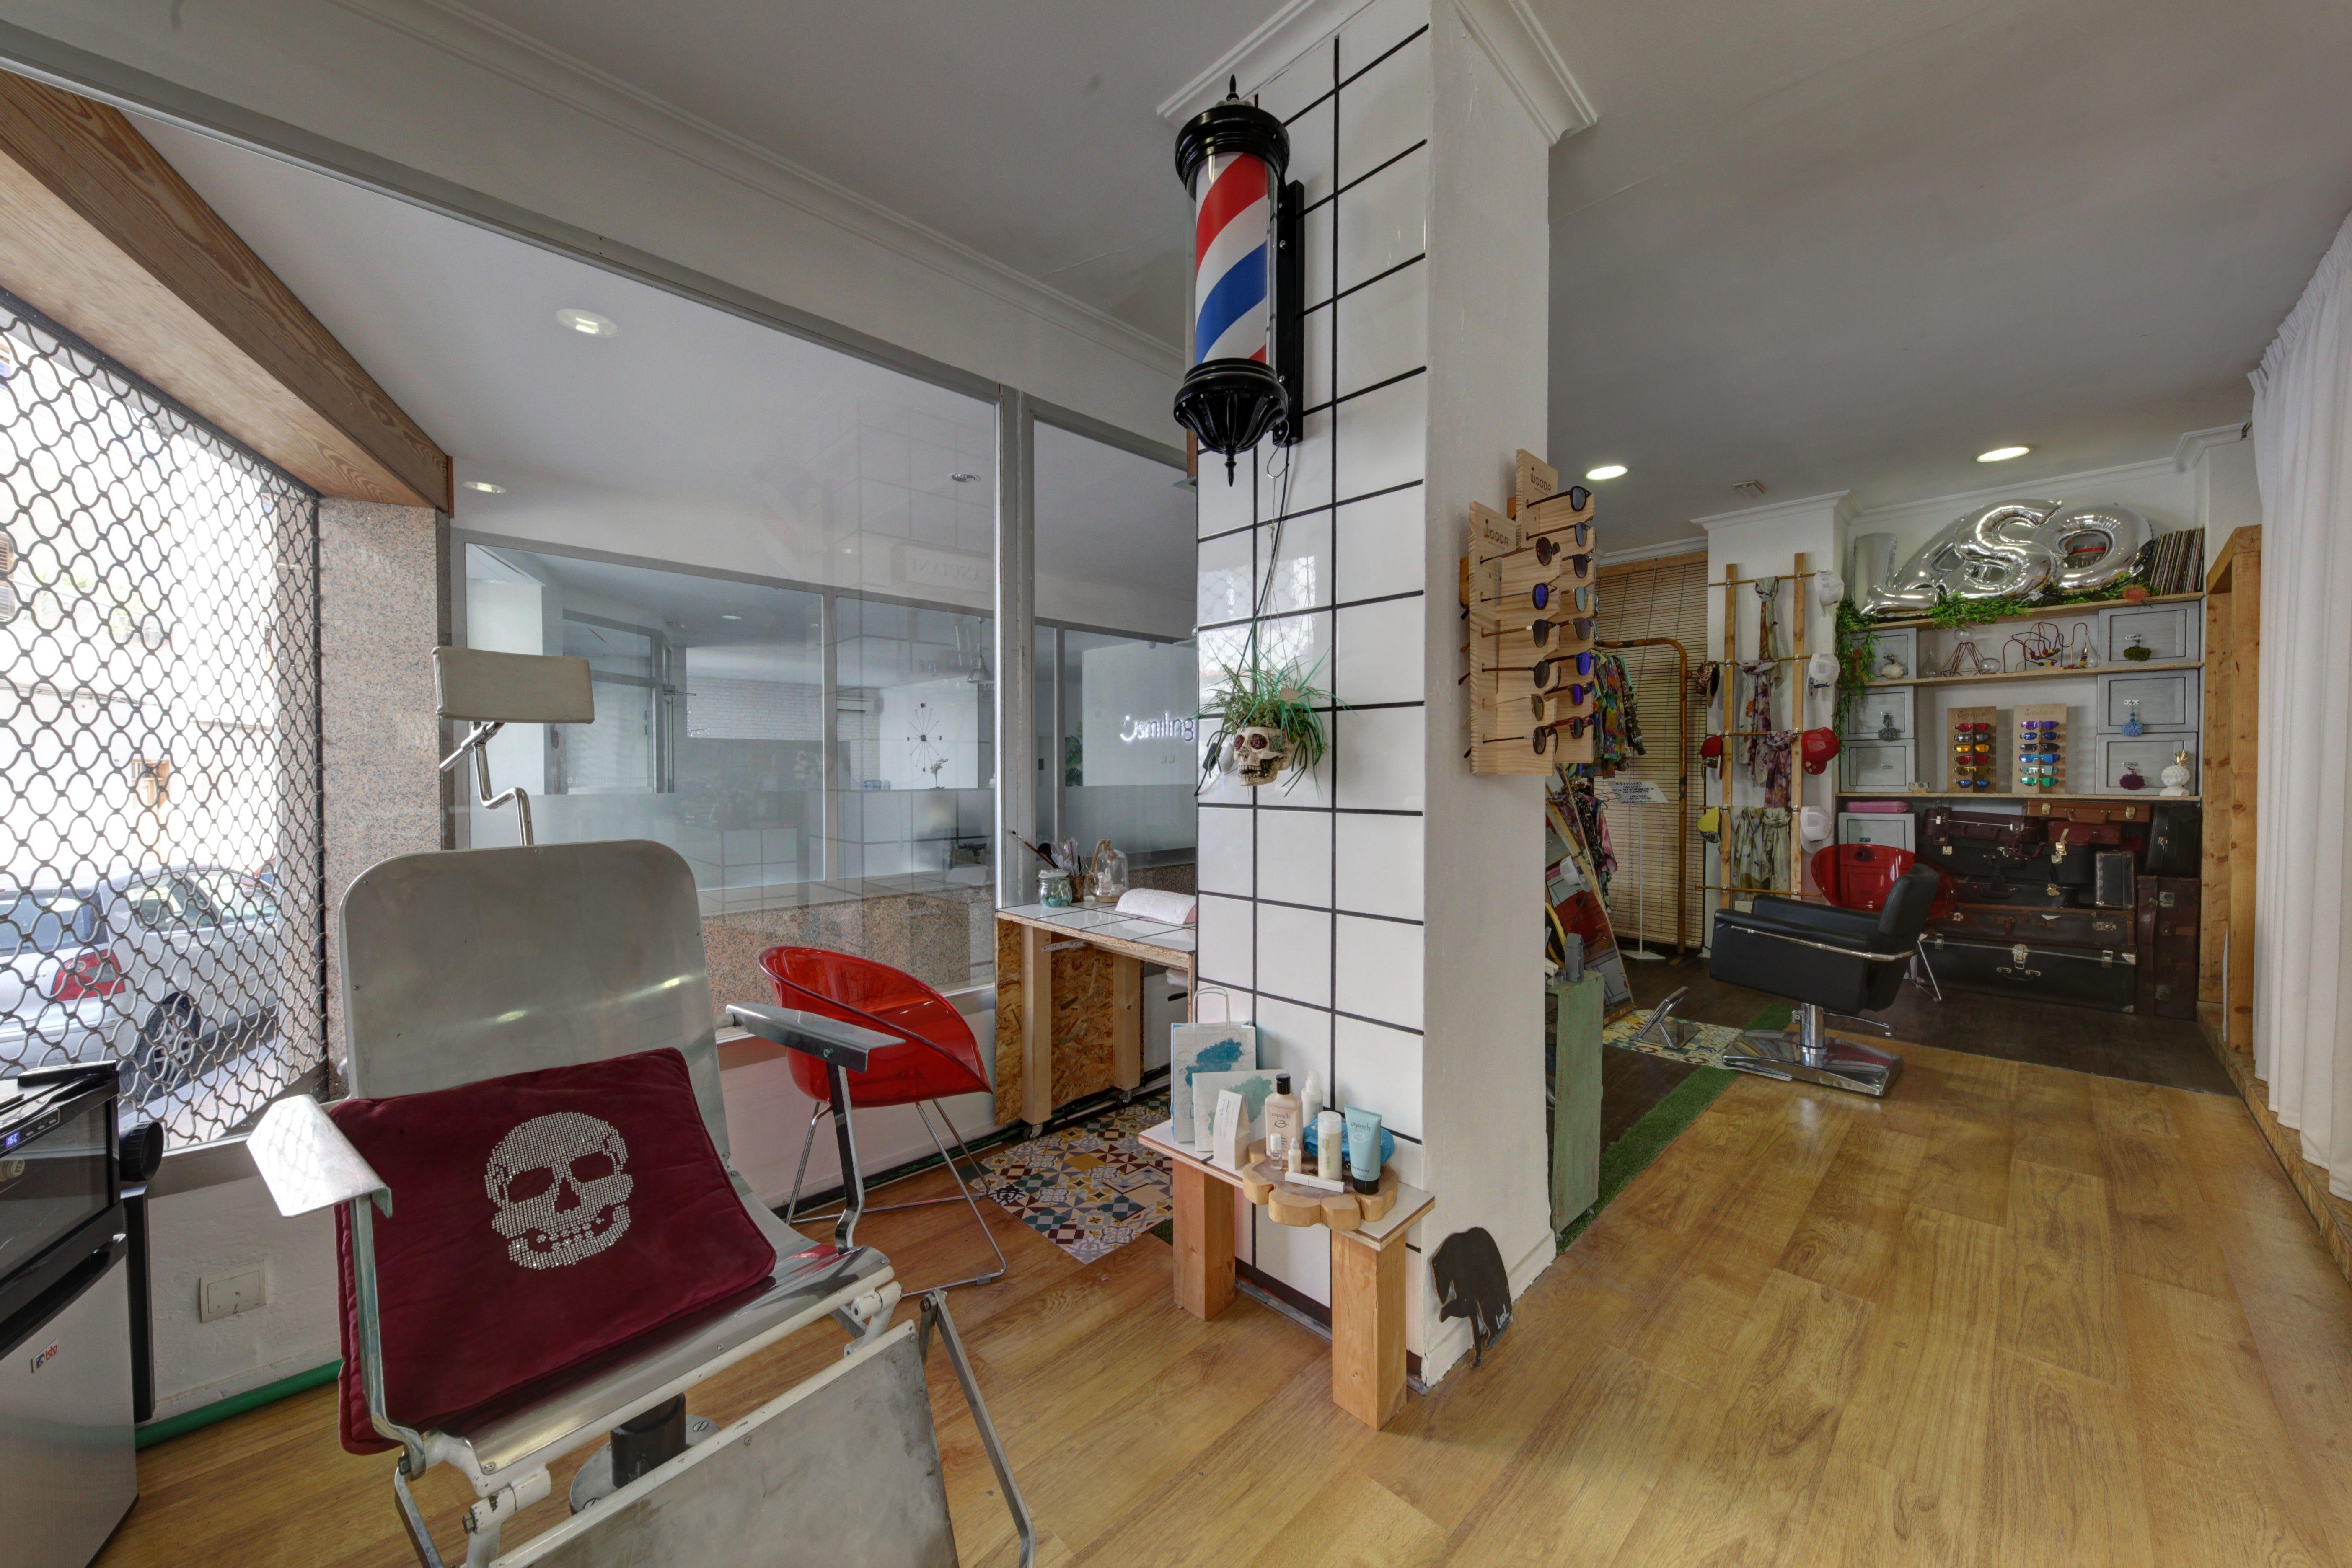 Foto 1 de Hair salons en Sant Antoni de Portmany | Estudio de Laso